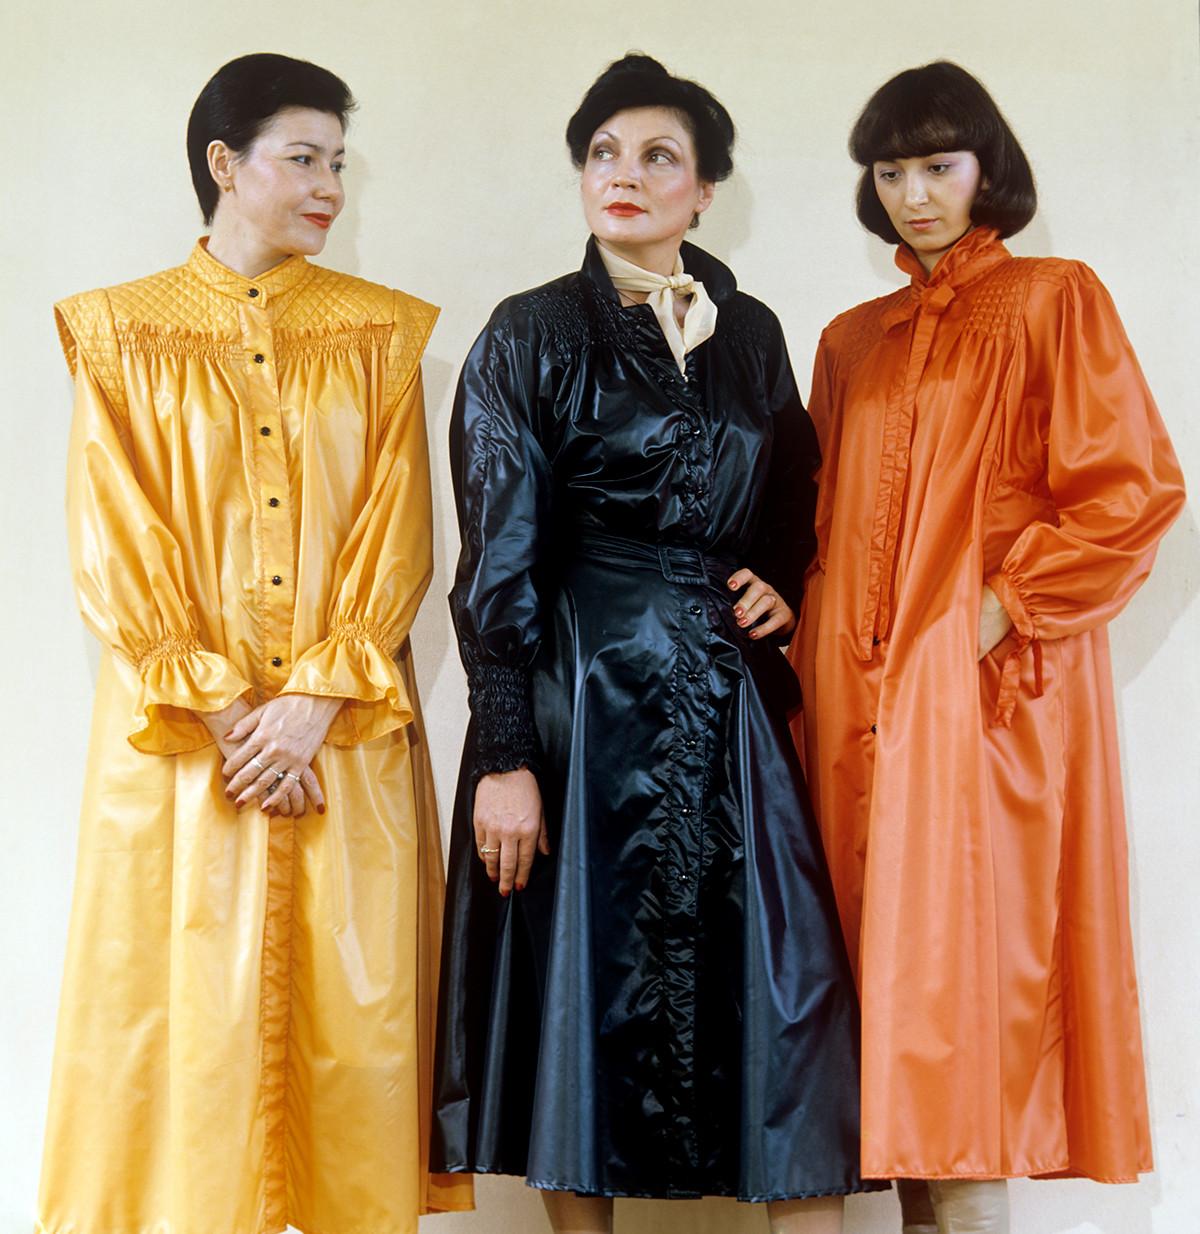 Soviet fashion models in 1982.